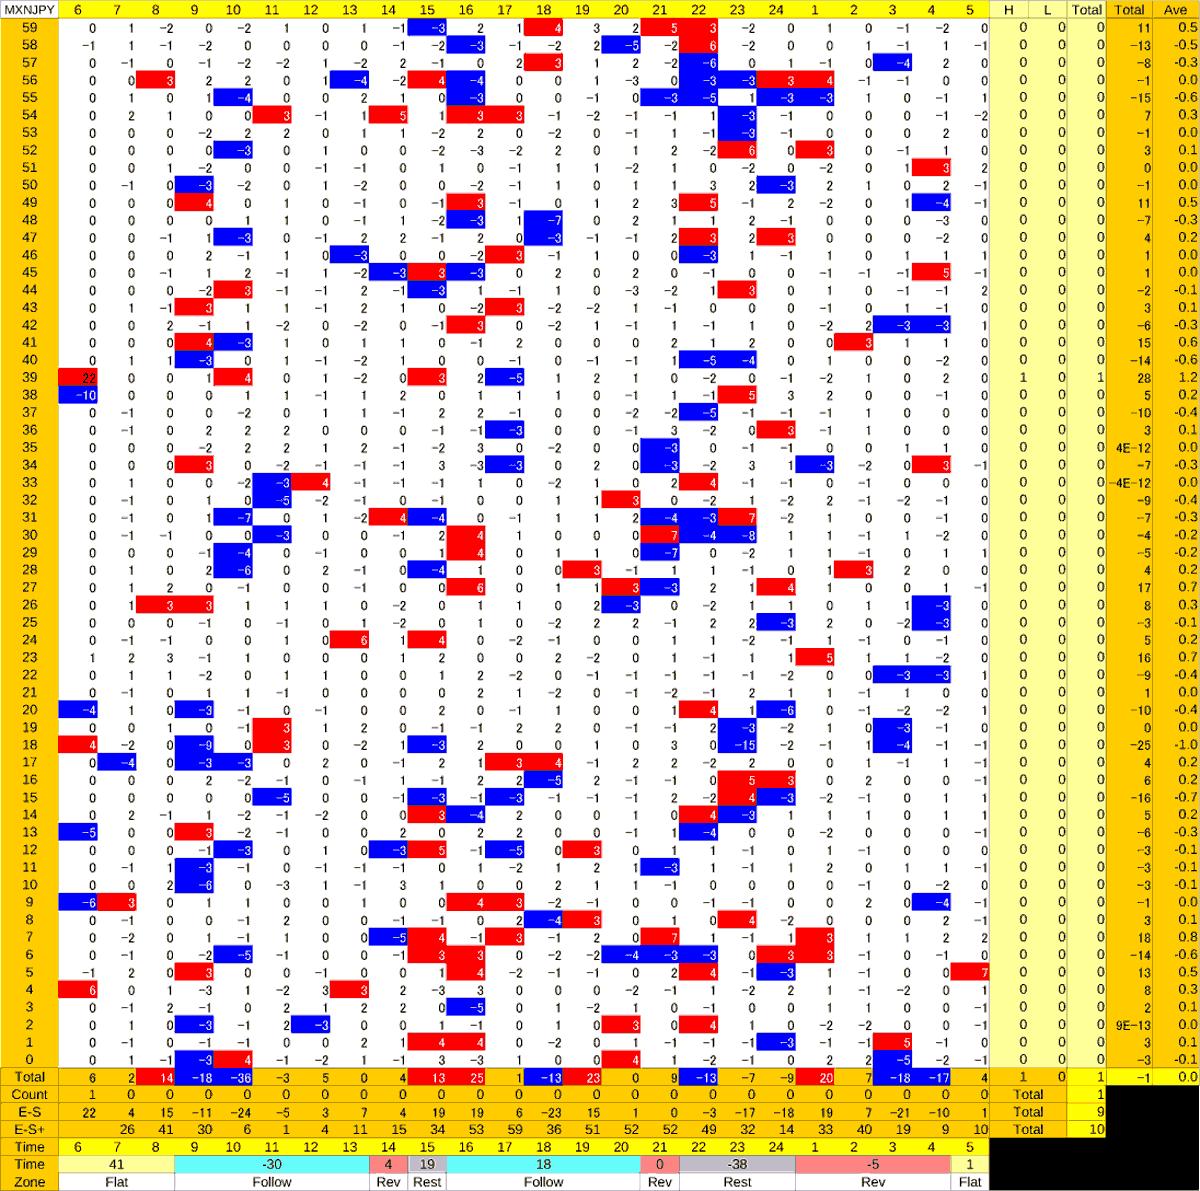 20200617_HS(3)MXNJPY